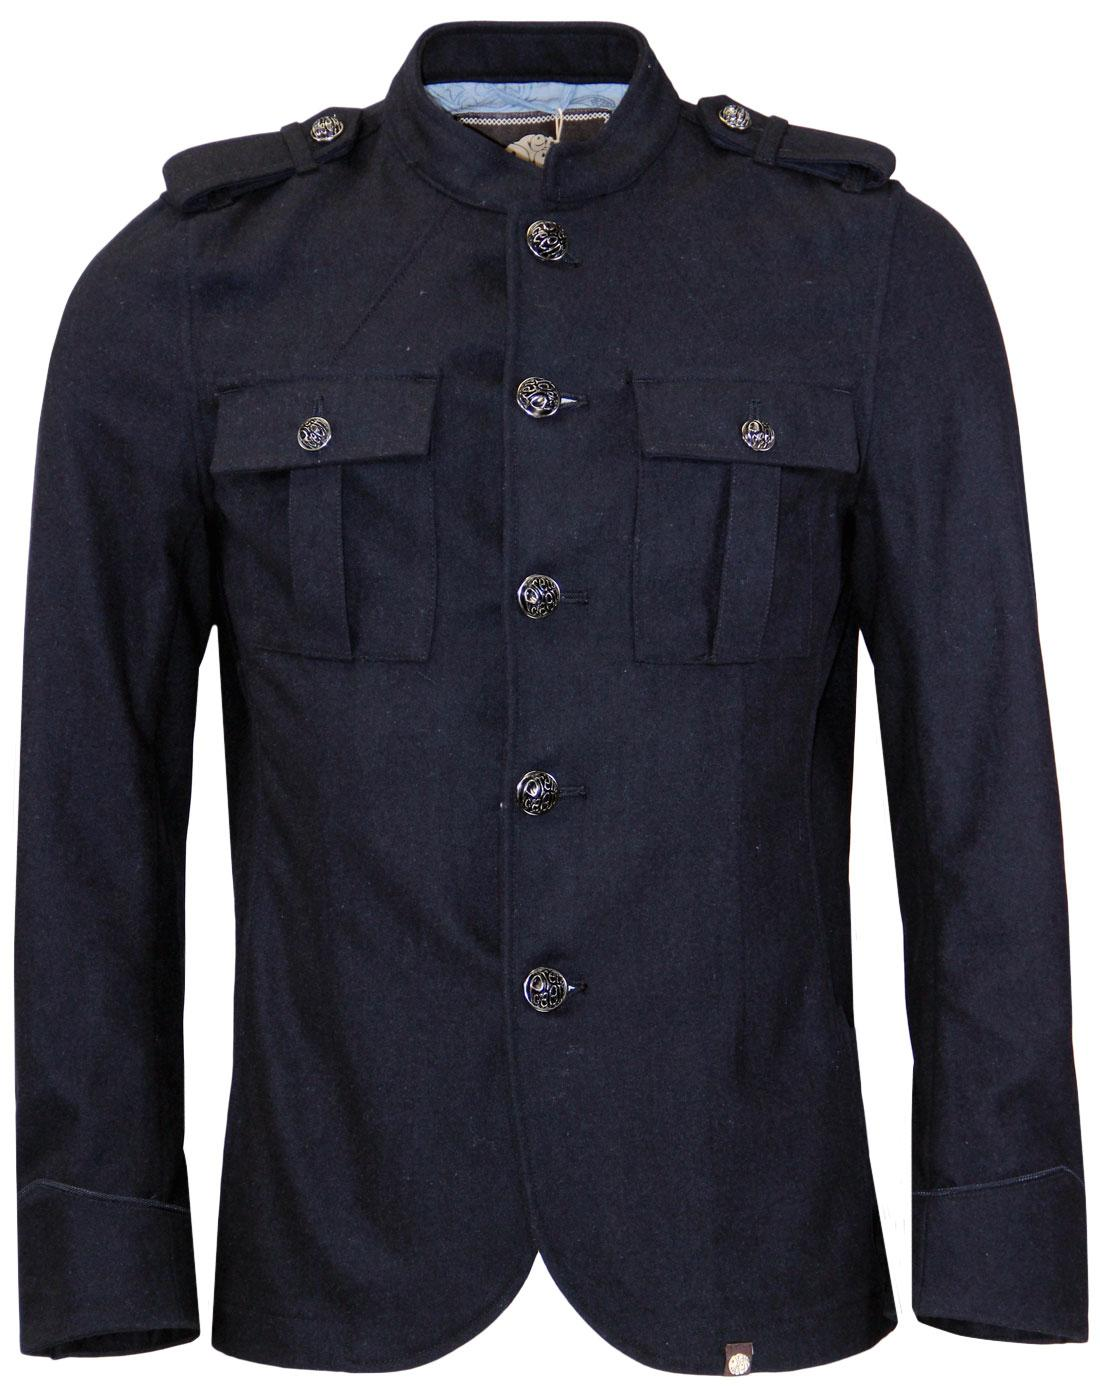 Wool Lennon PRETTY GREEN 60s Mod Military Jacket